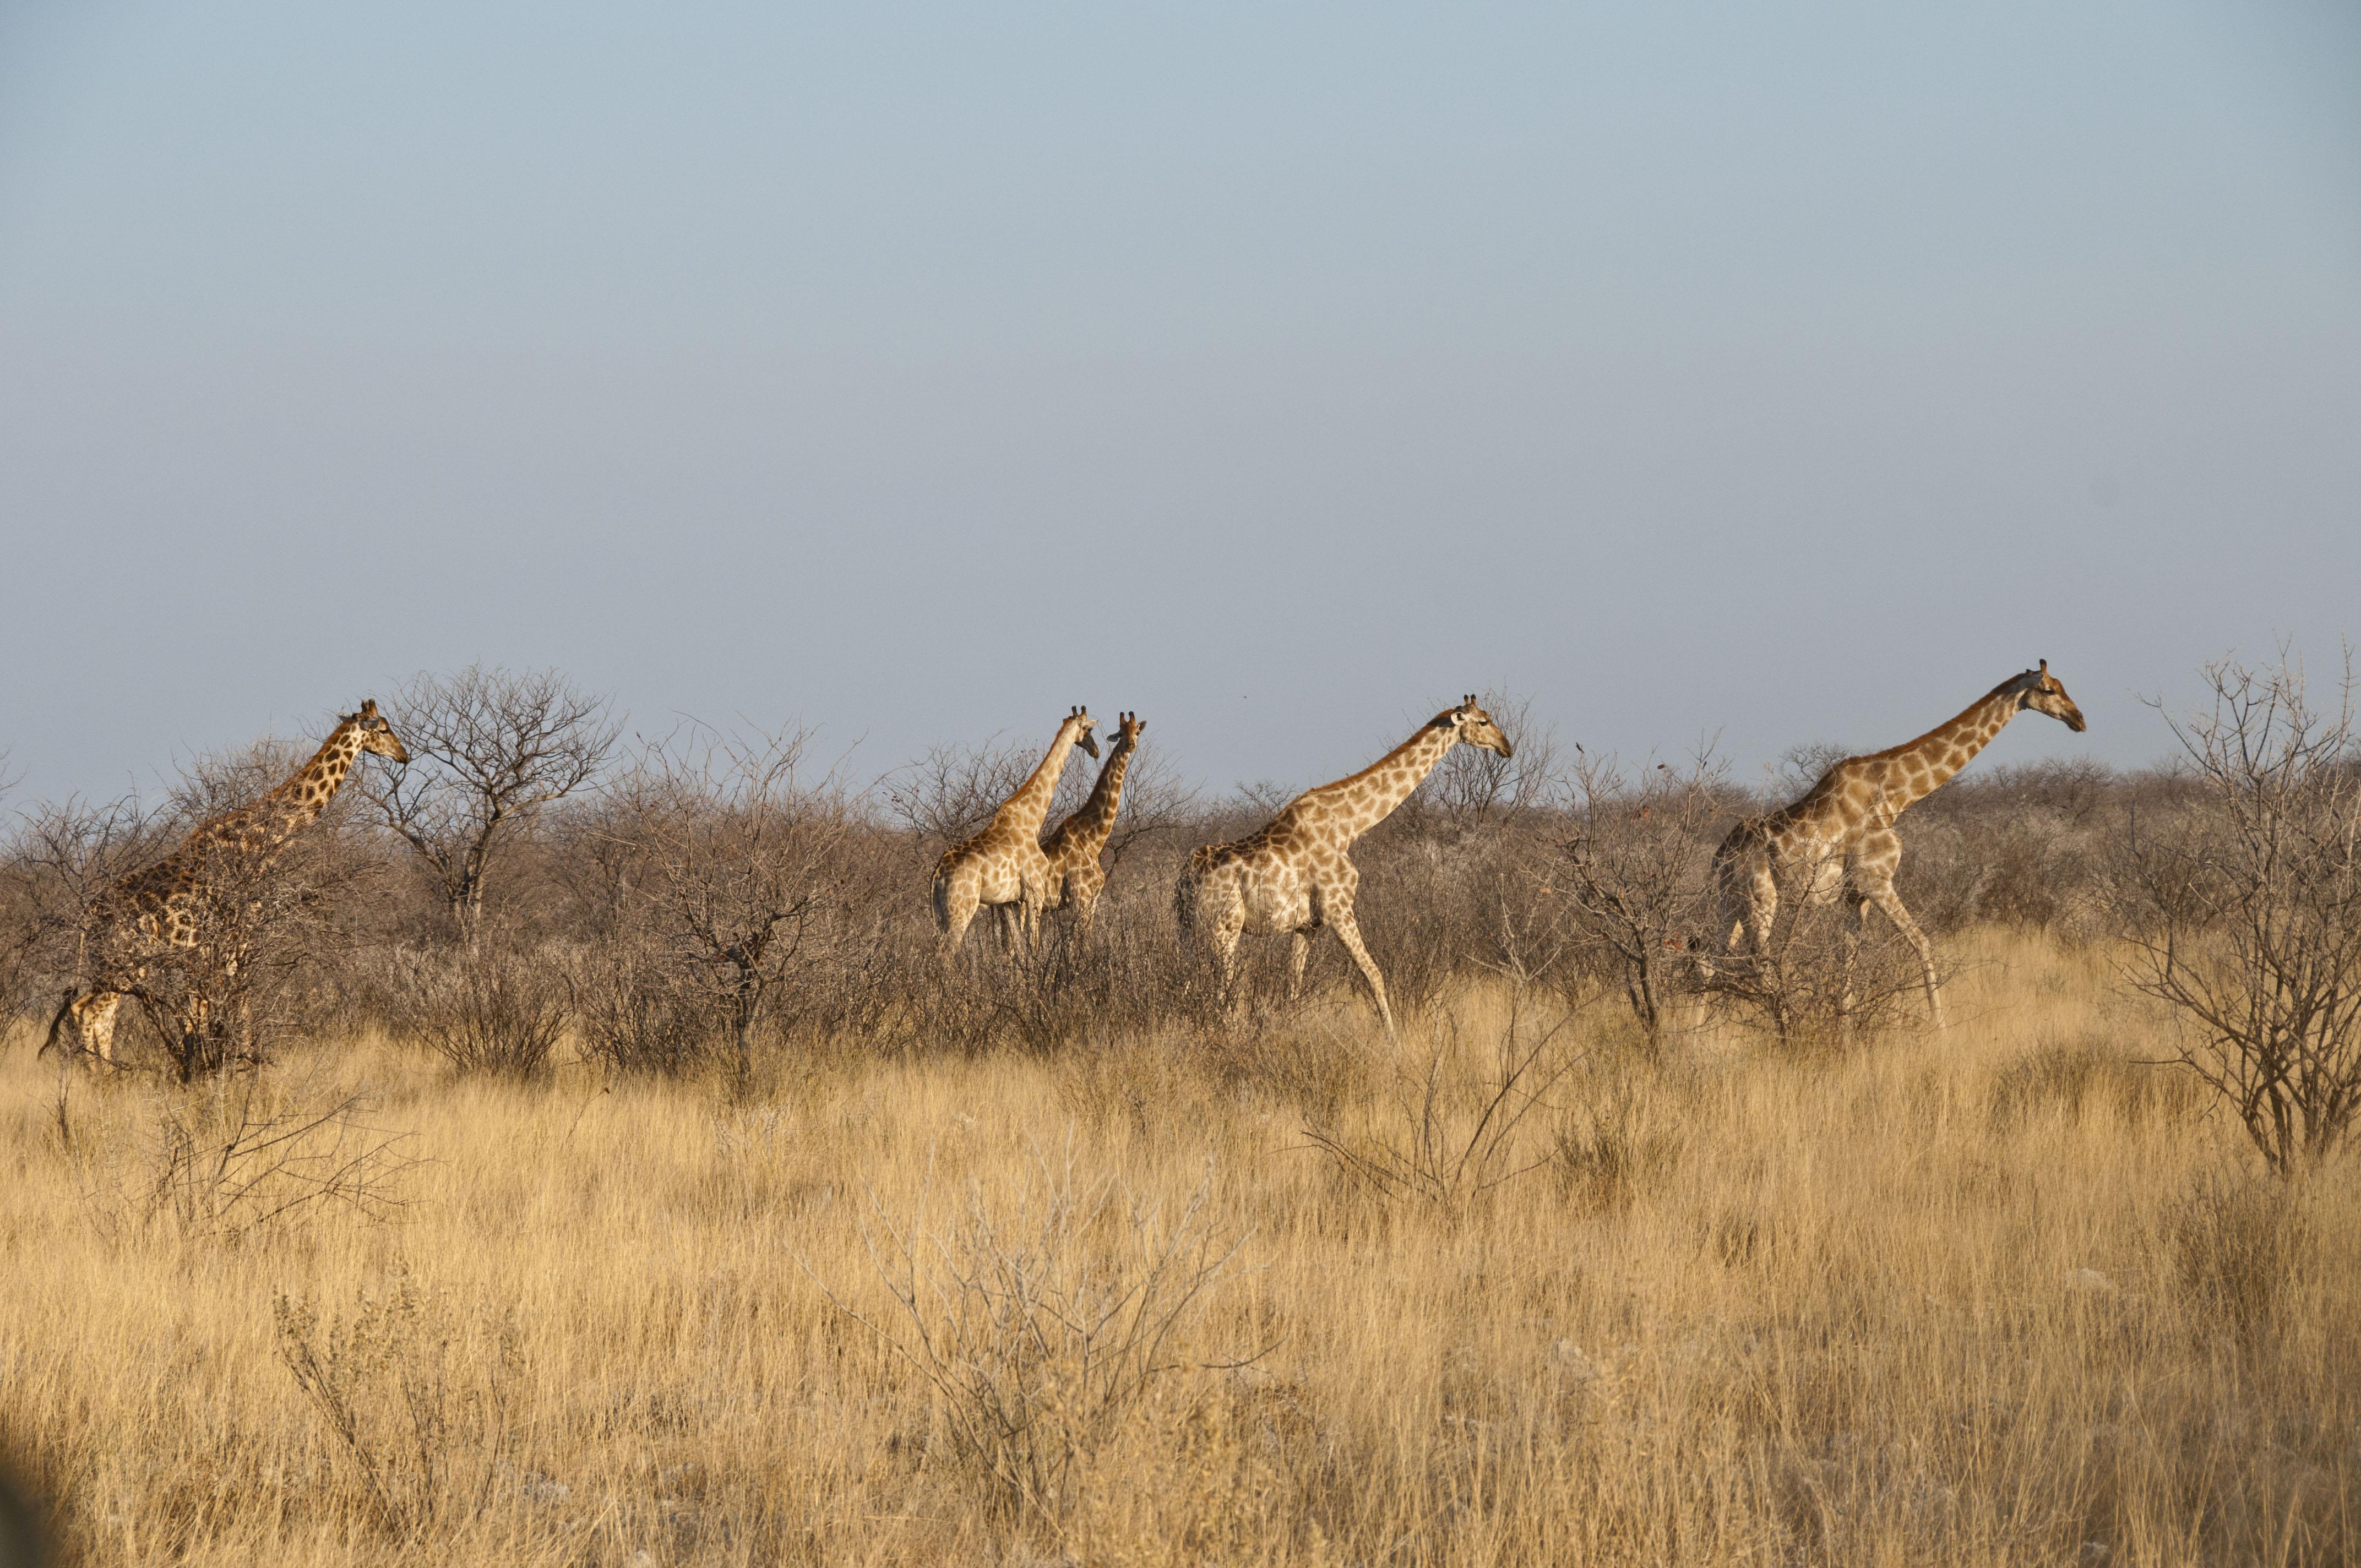 namibia_2014_kaokoveld-etoscha_122